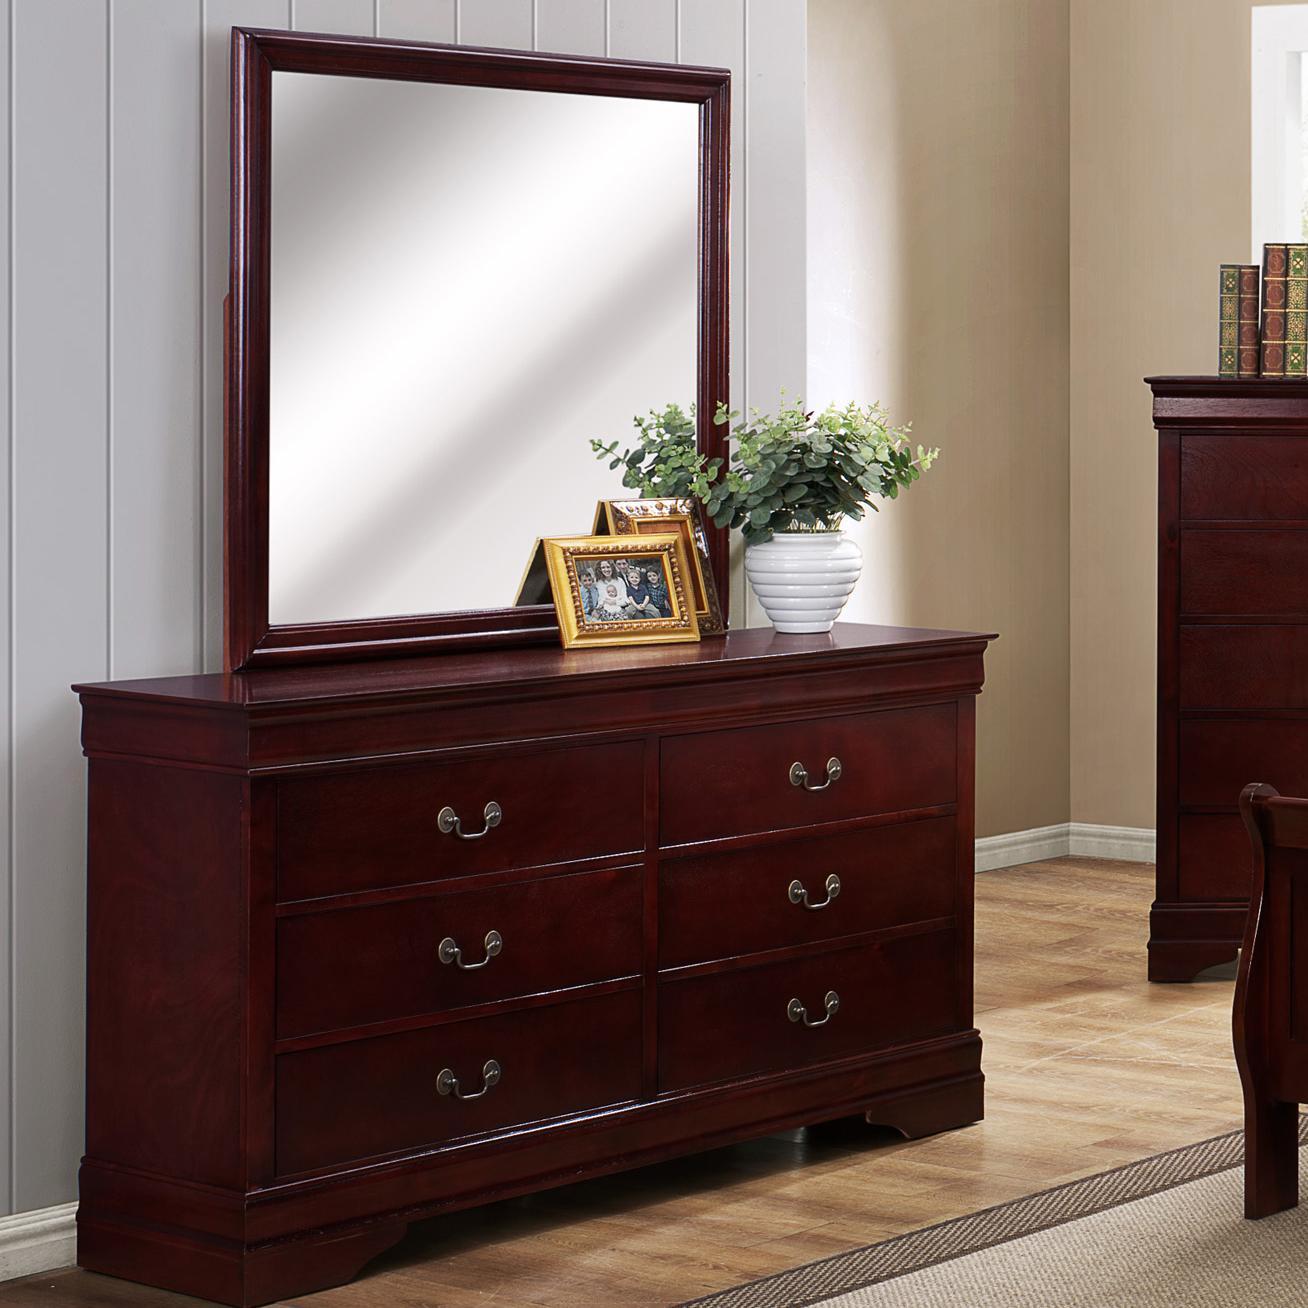 Crown Mark B3800 Louis Phillipe 6 Drawer Dresser with